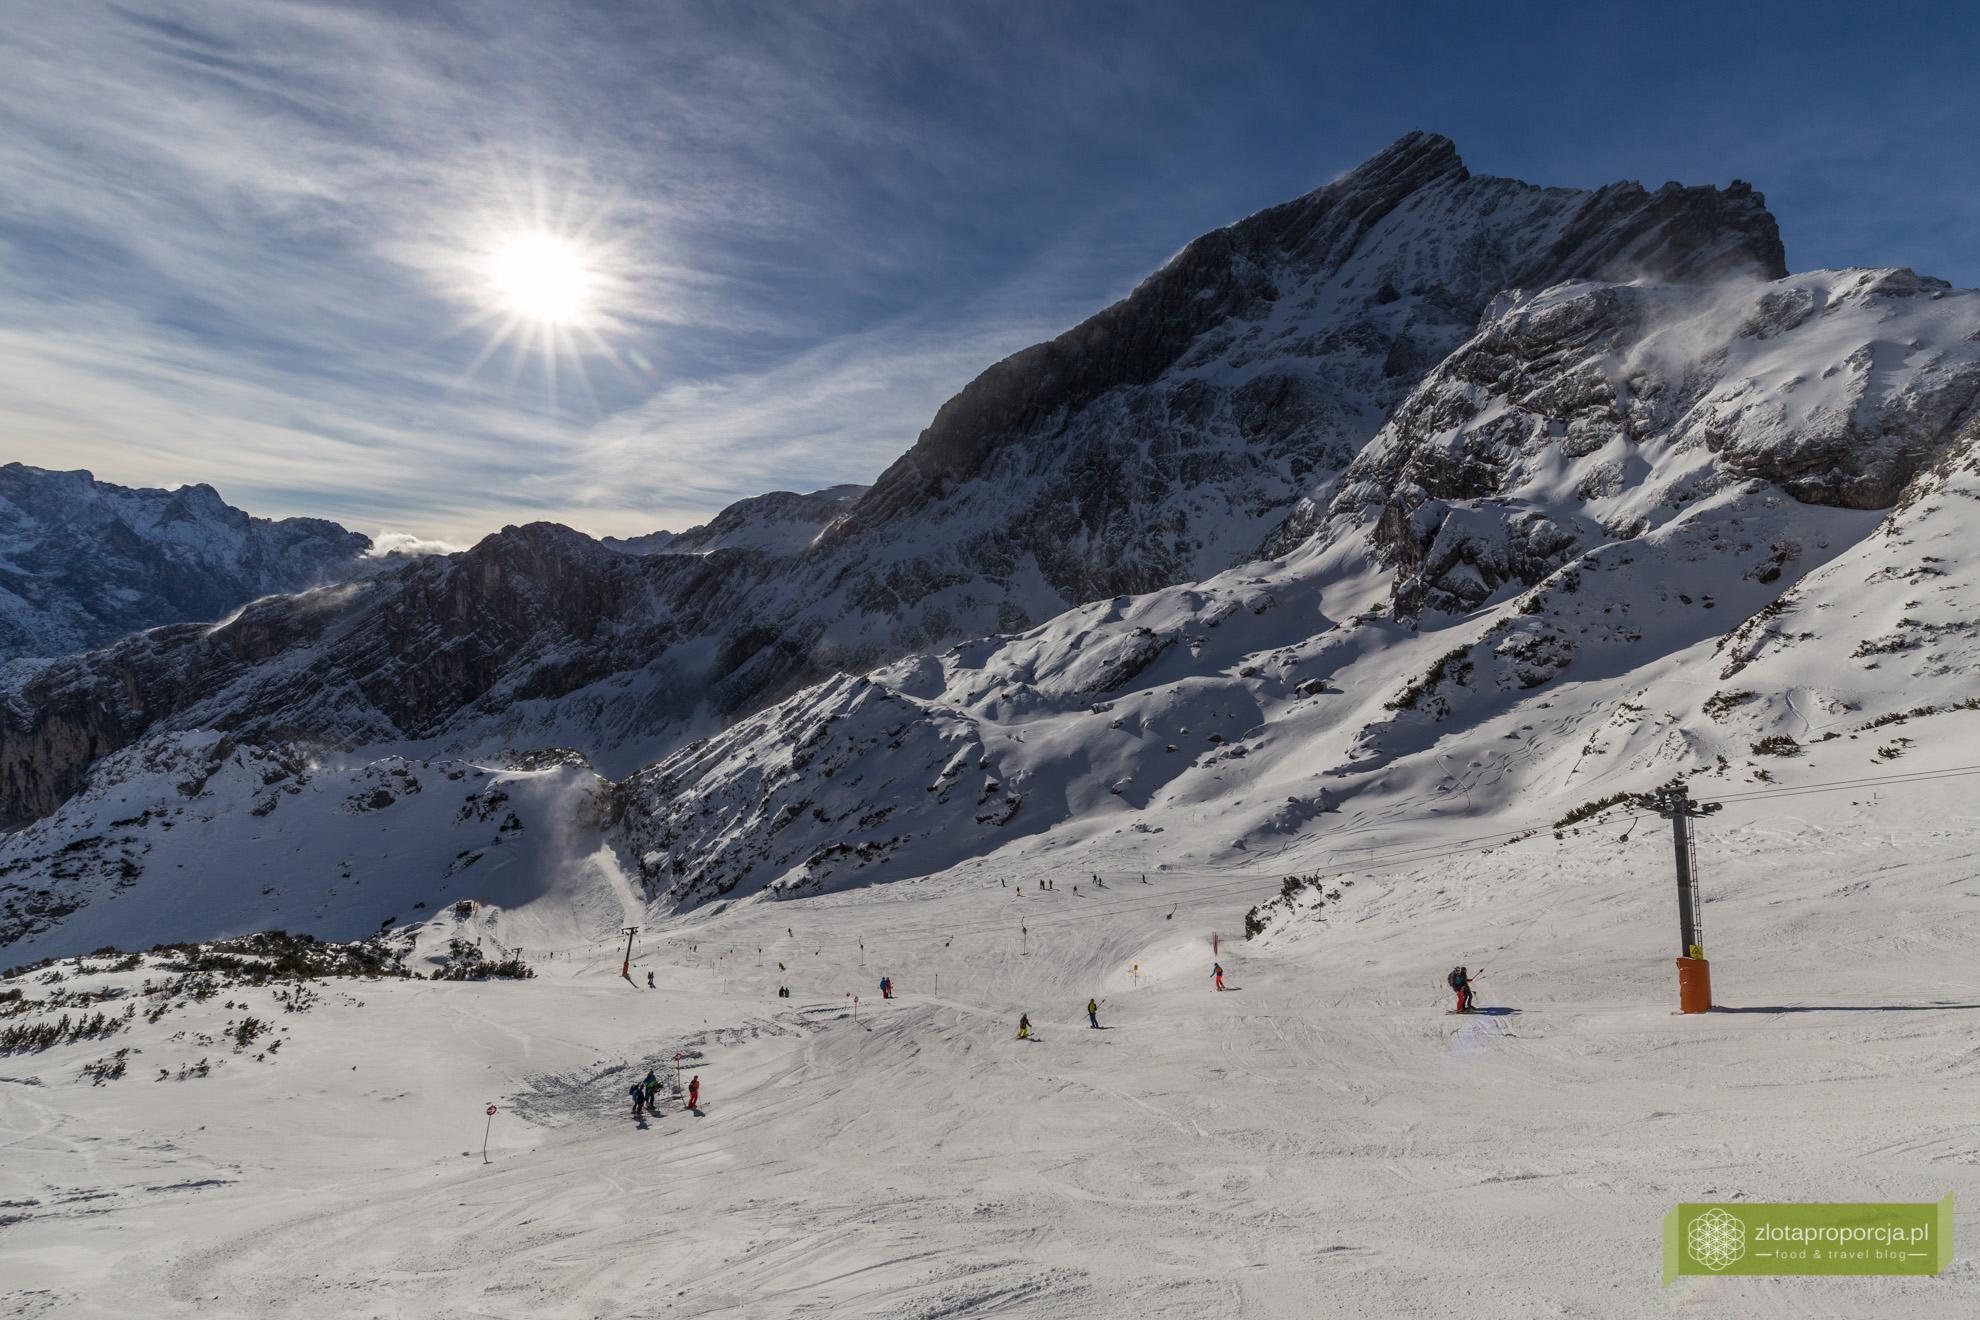 Garmisch-Partenkirchen, Bawaria, narty, snowboard, narty w Niemczech